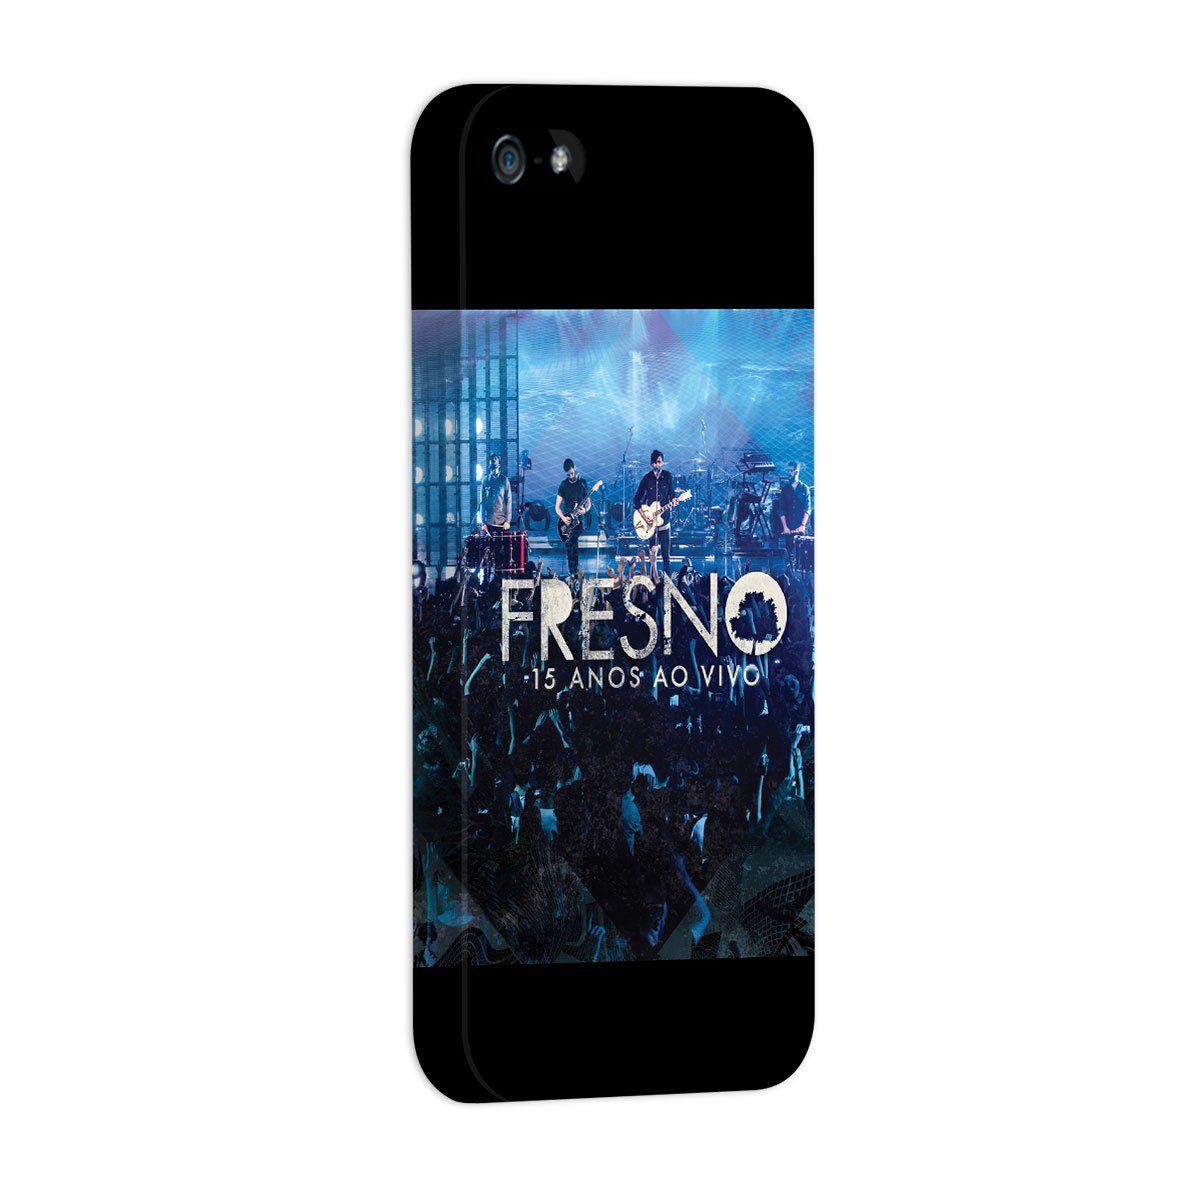 Capa para iPhone 5/5S Fresno Capa